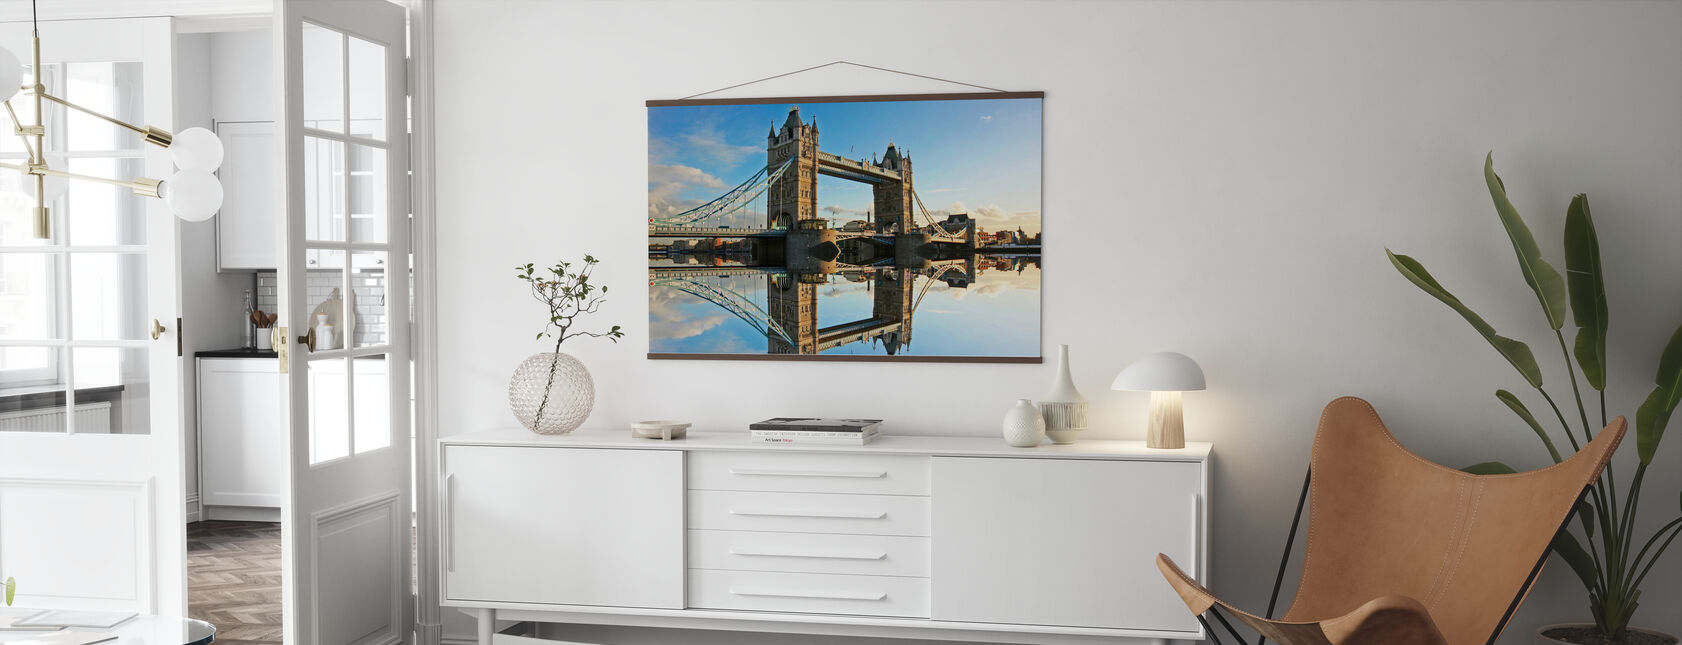 Tower Bridge bij zonsondergang - Poster - Woonkamer